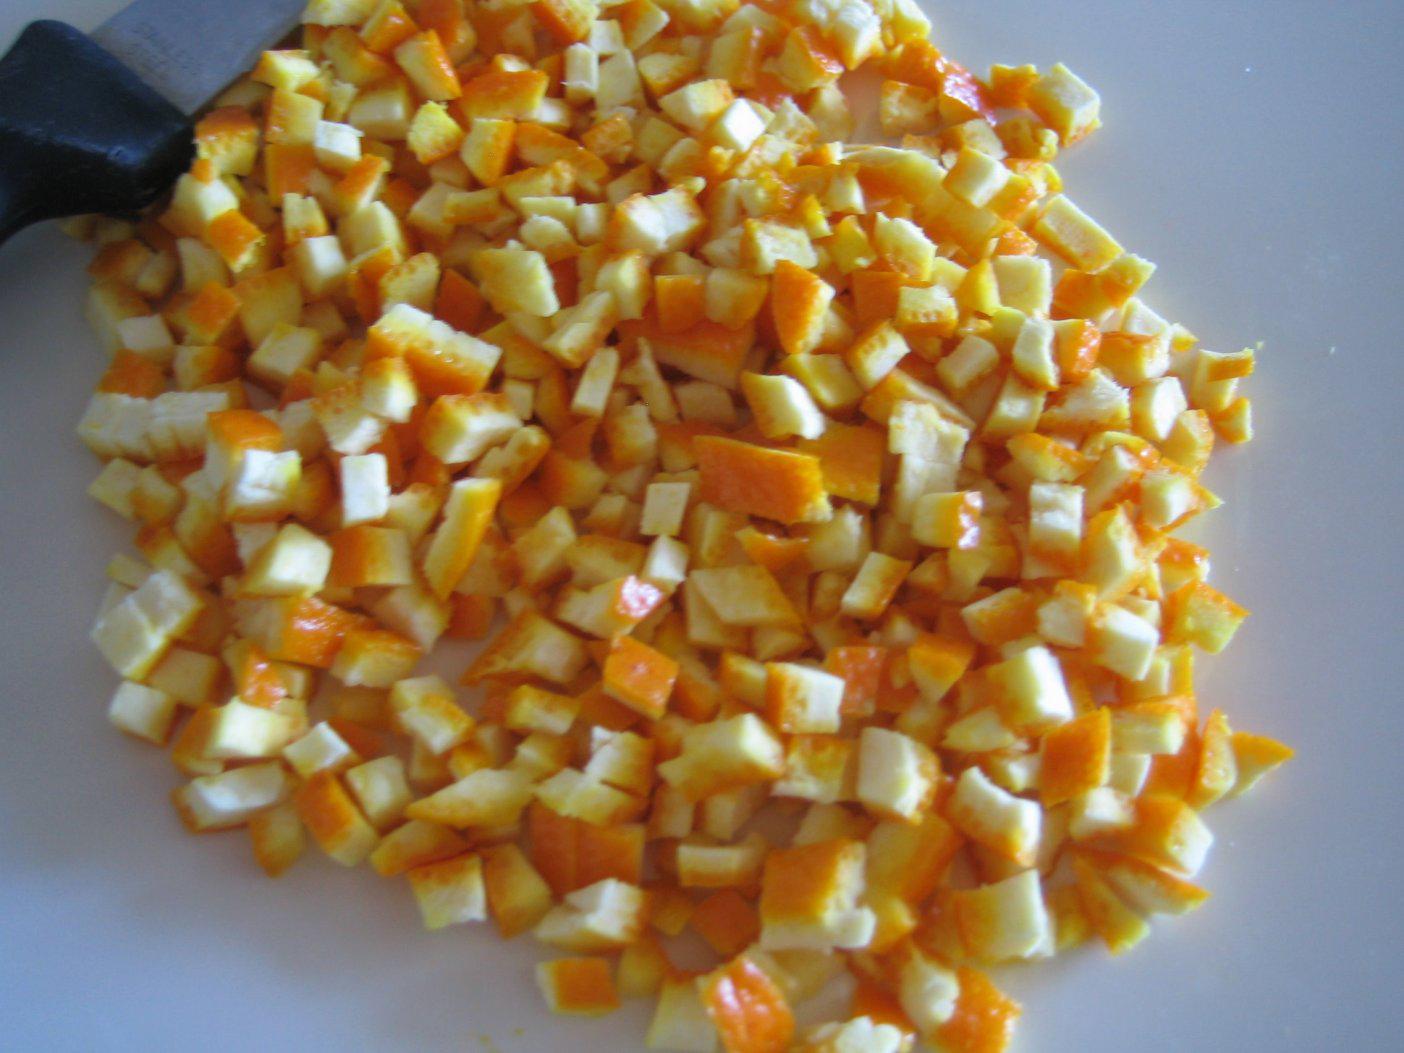 Chopped-Orange-peel